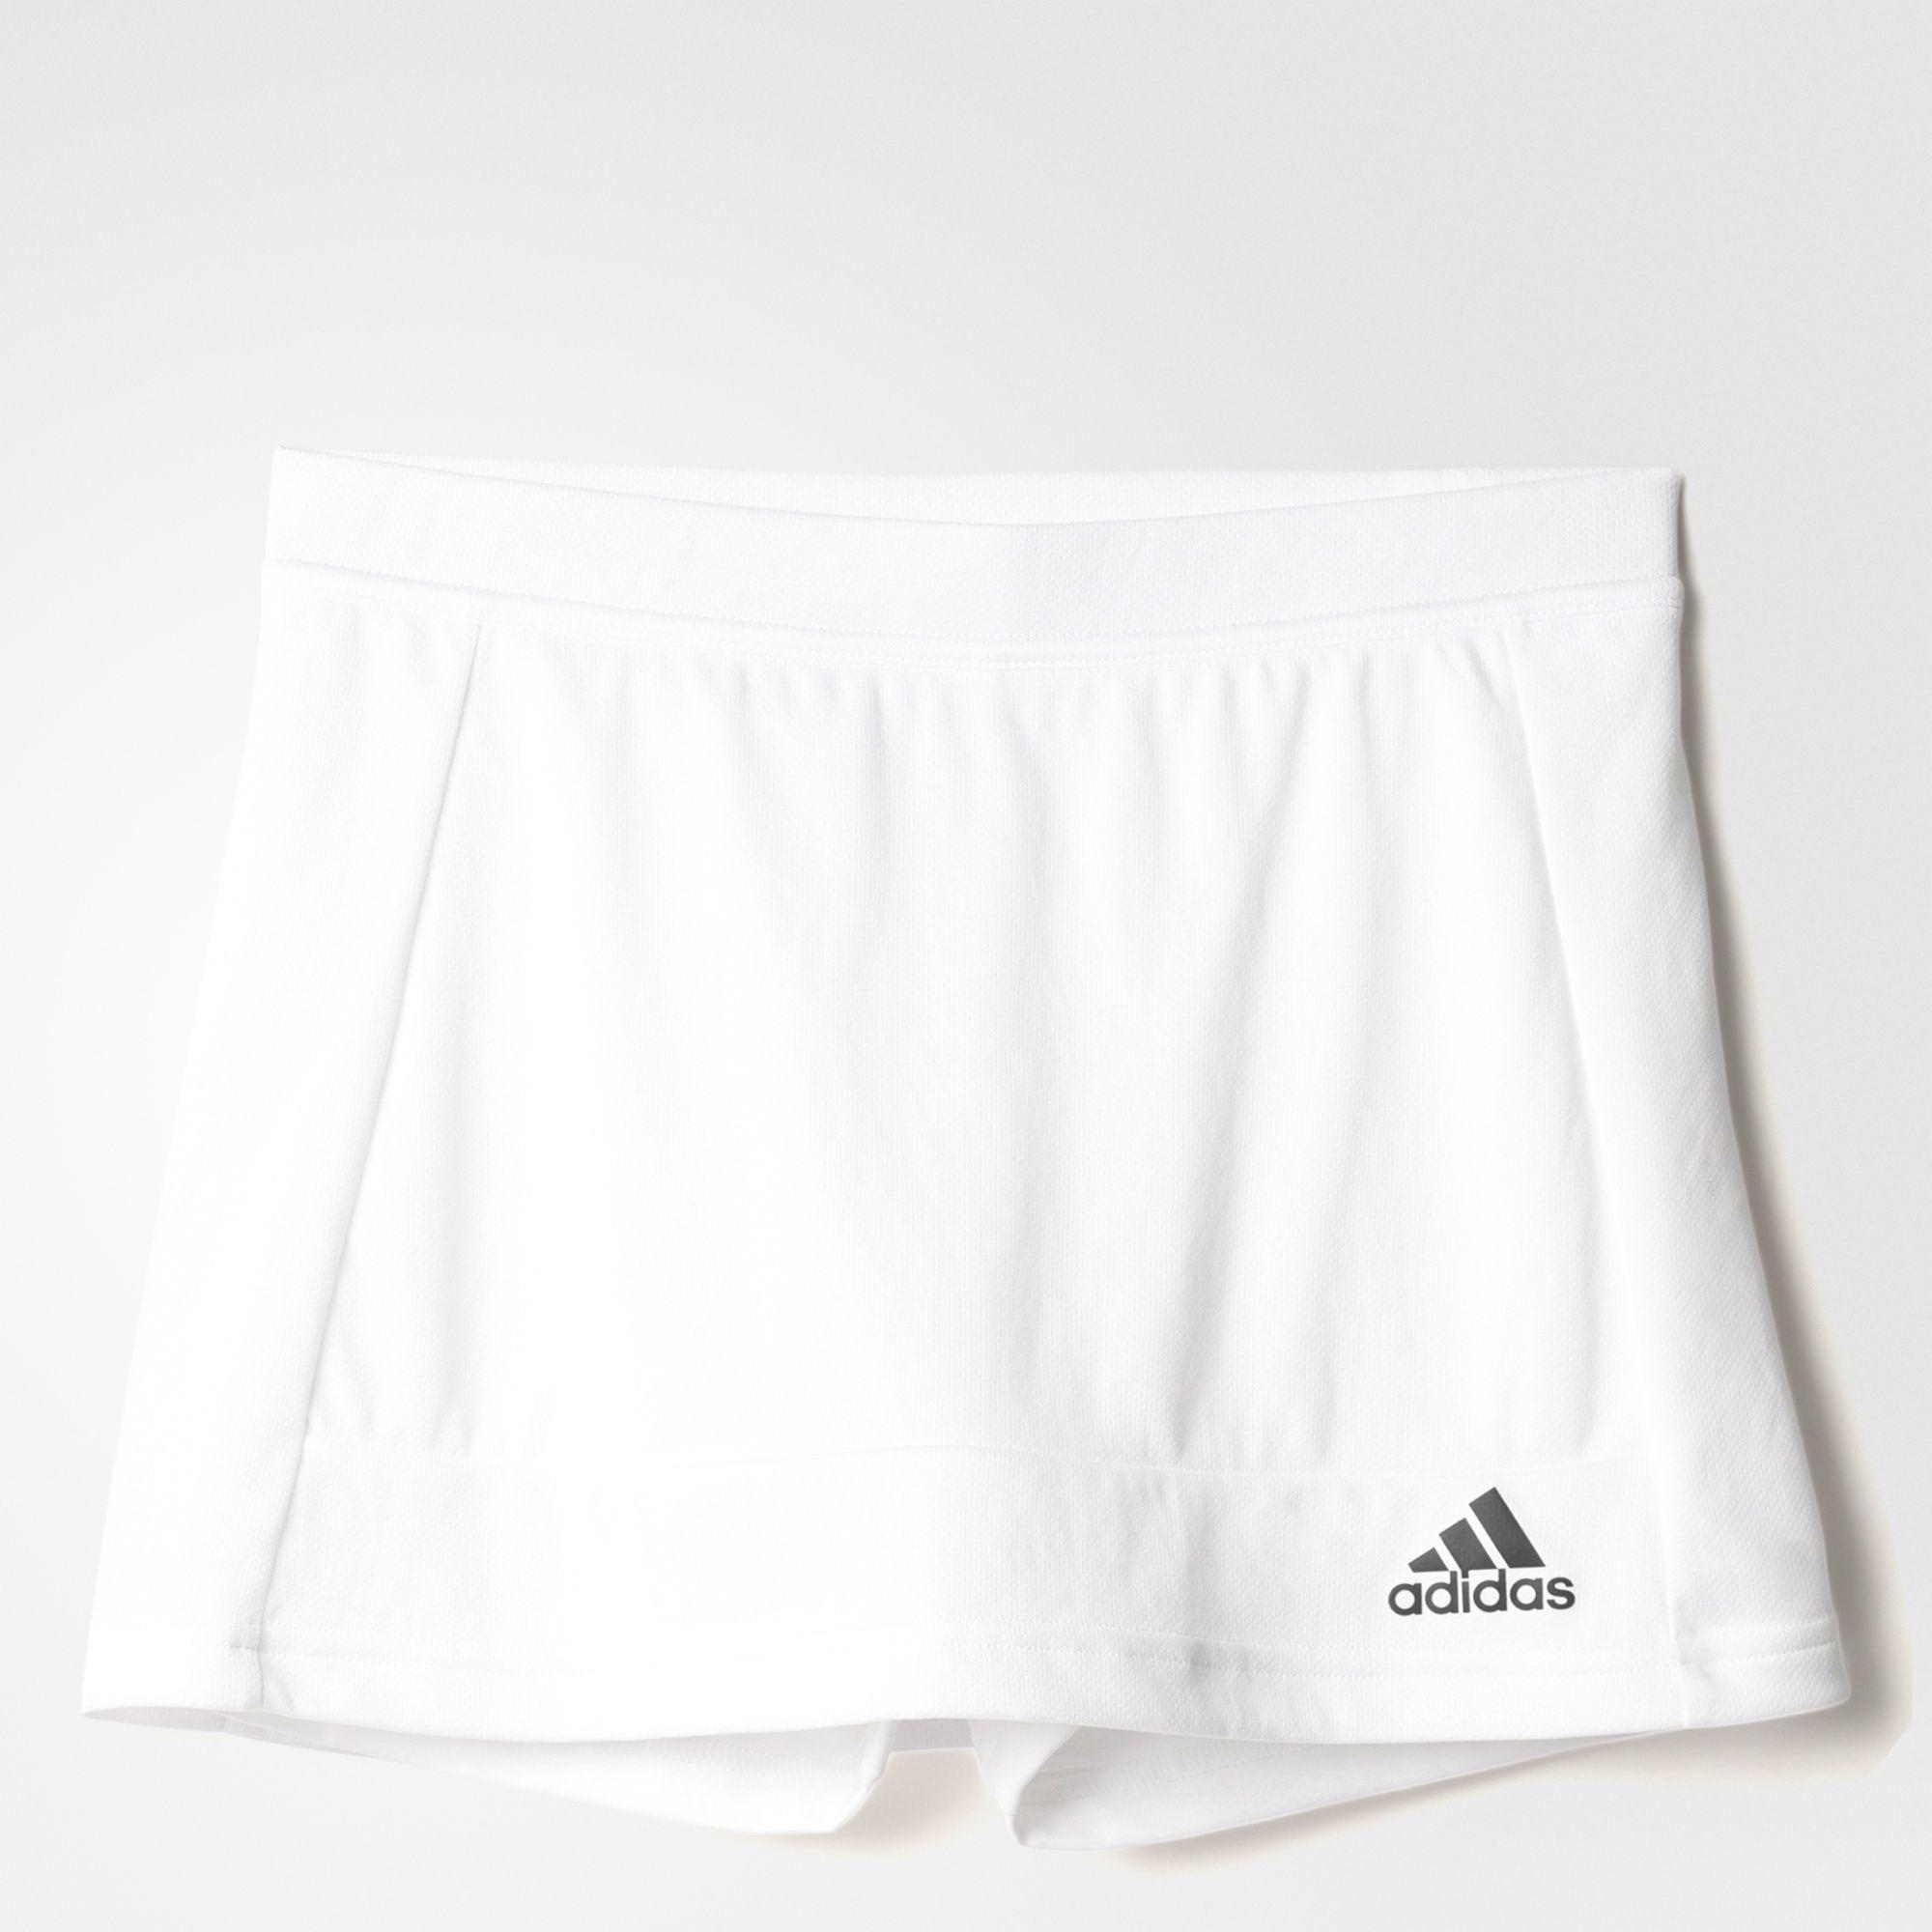 premium selection b644d 47327 Adidas Girls T16 Club Skort - White - Tennisnuts.com